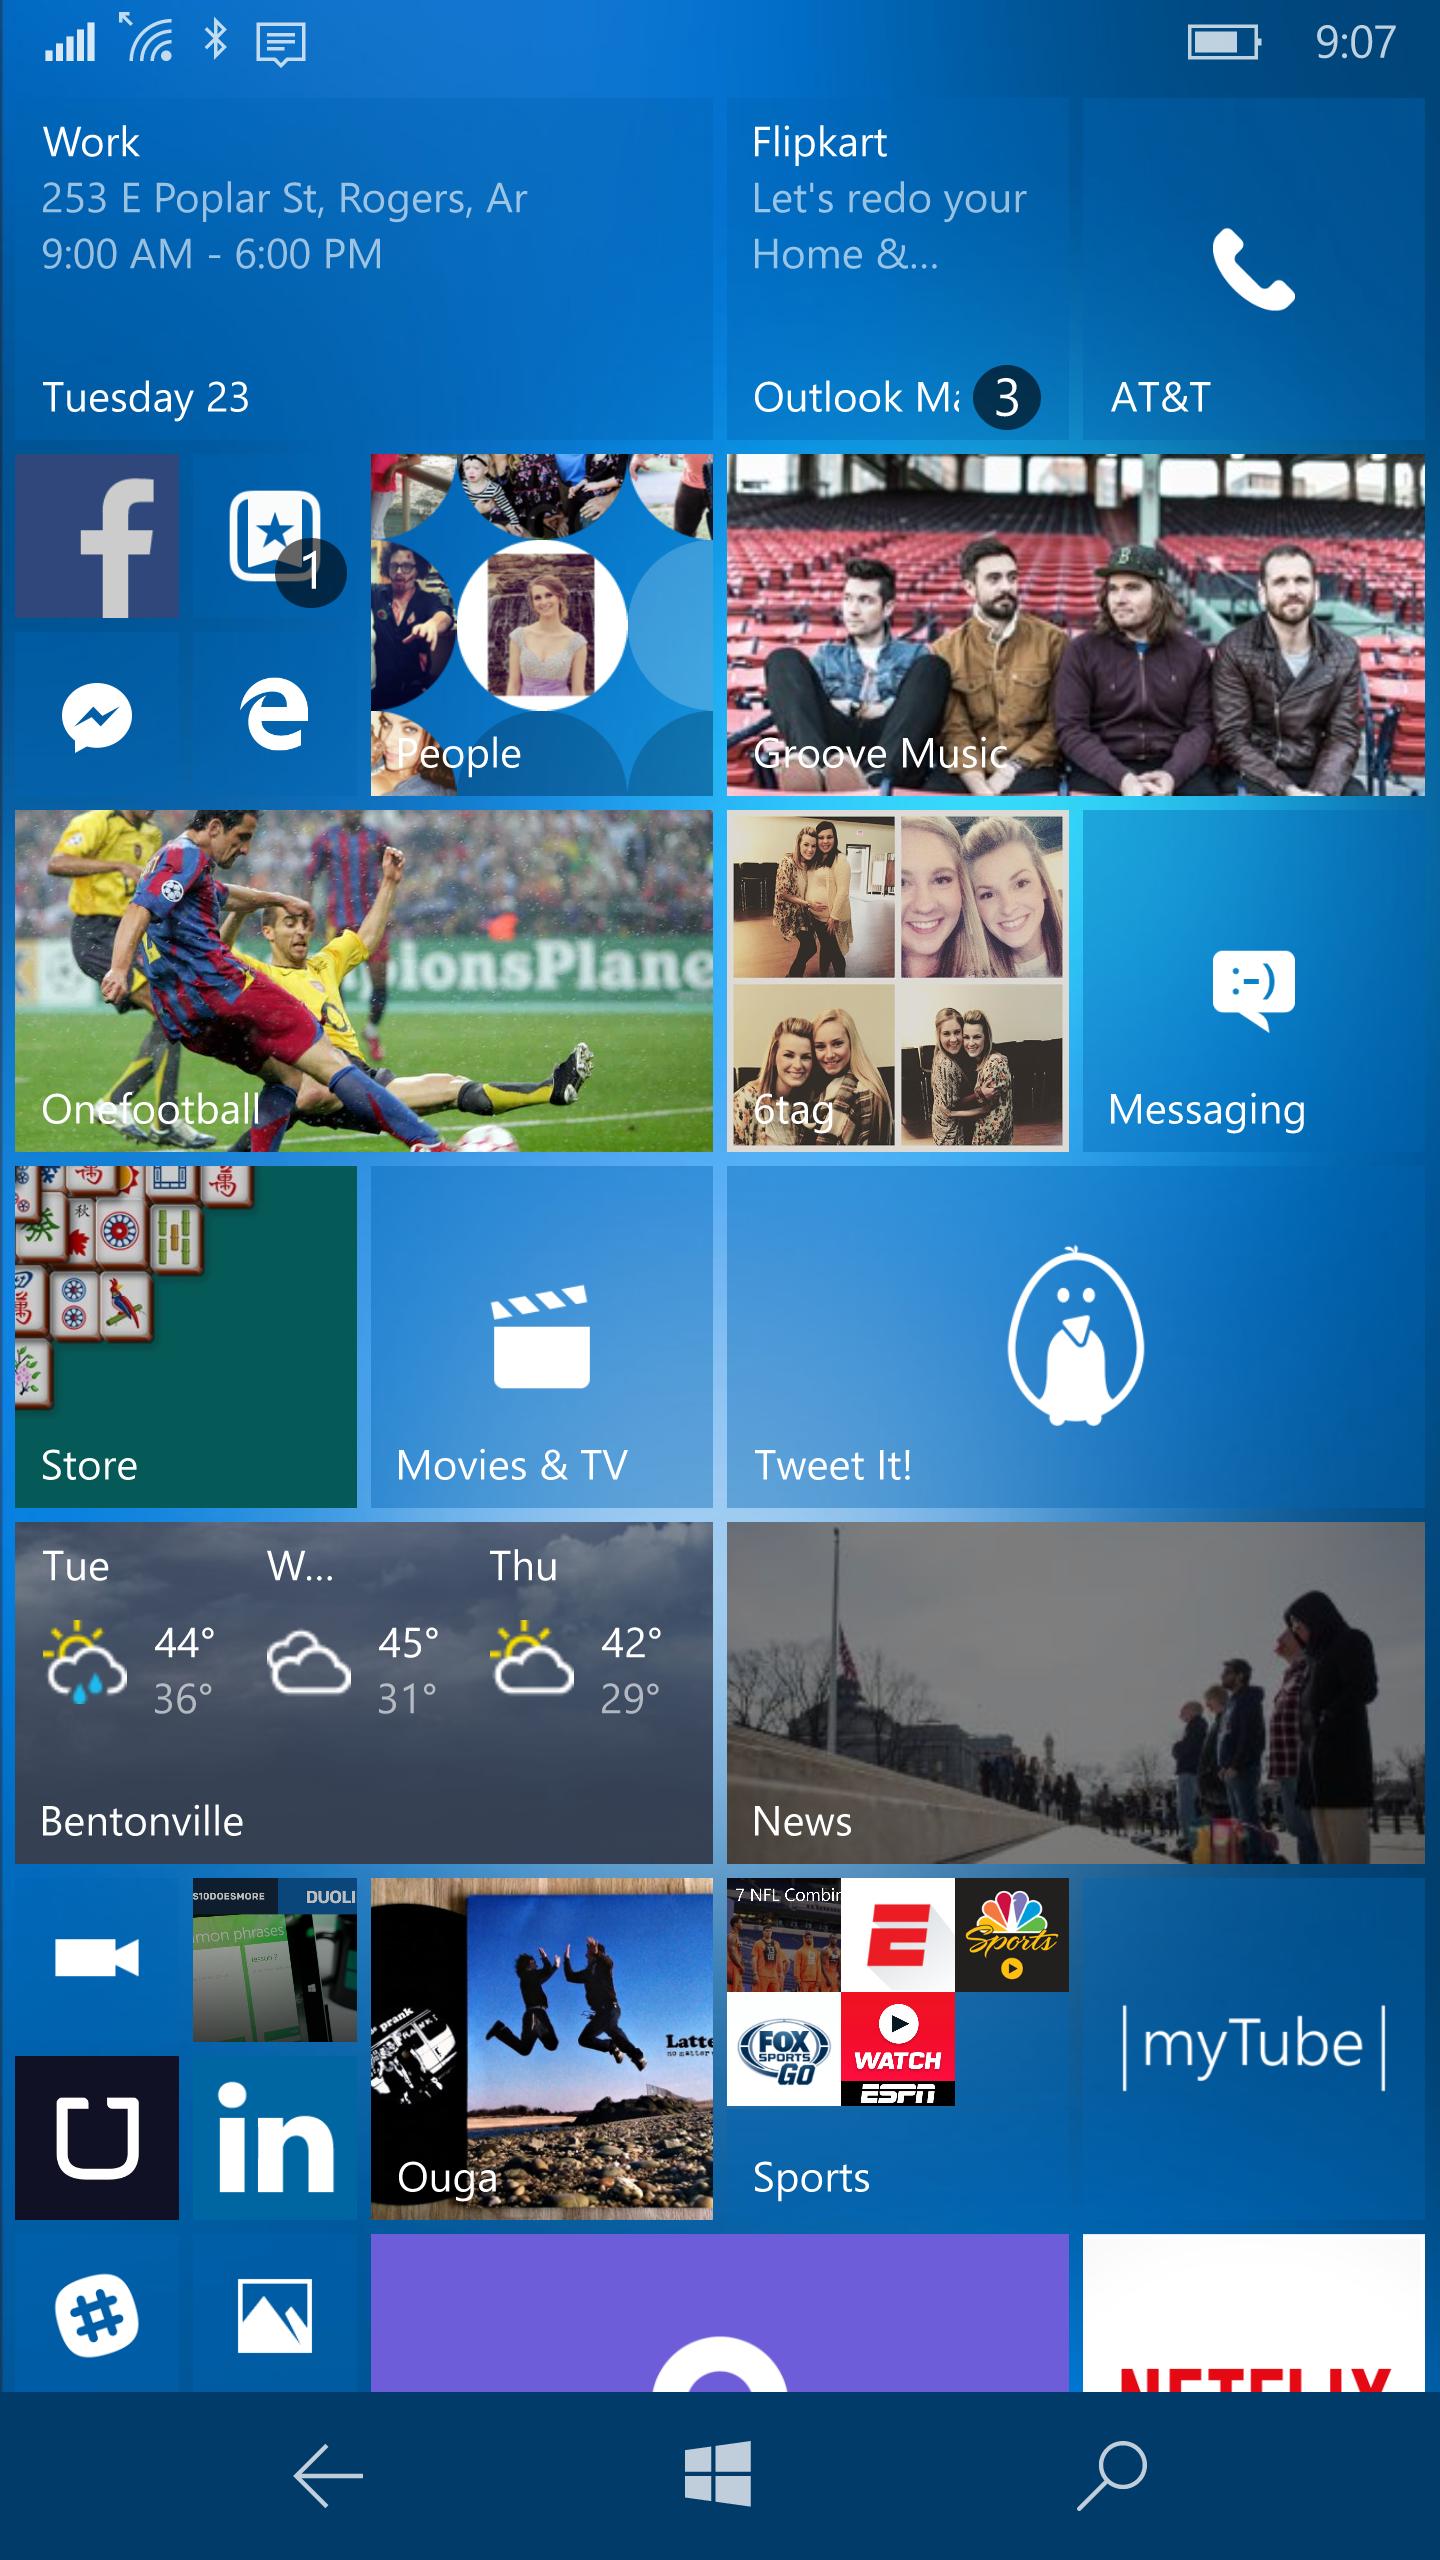 2/23/2016 Windows 10 Lumia 950 Windows phone, Start